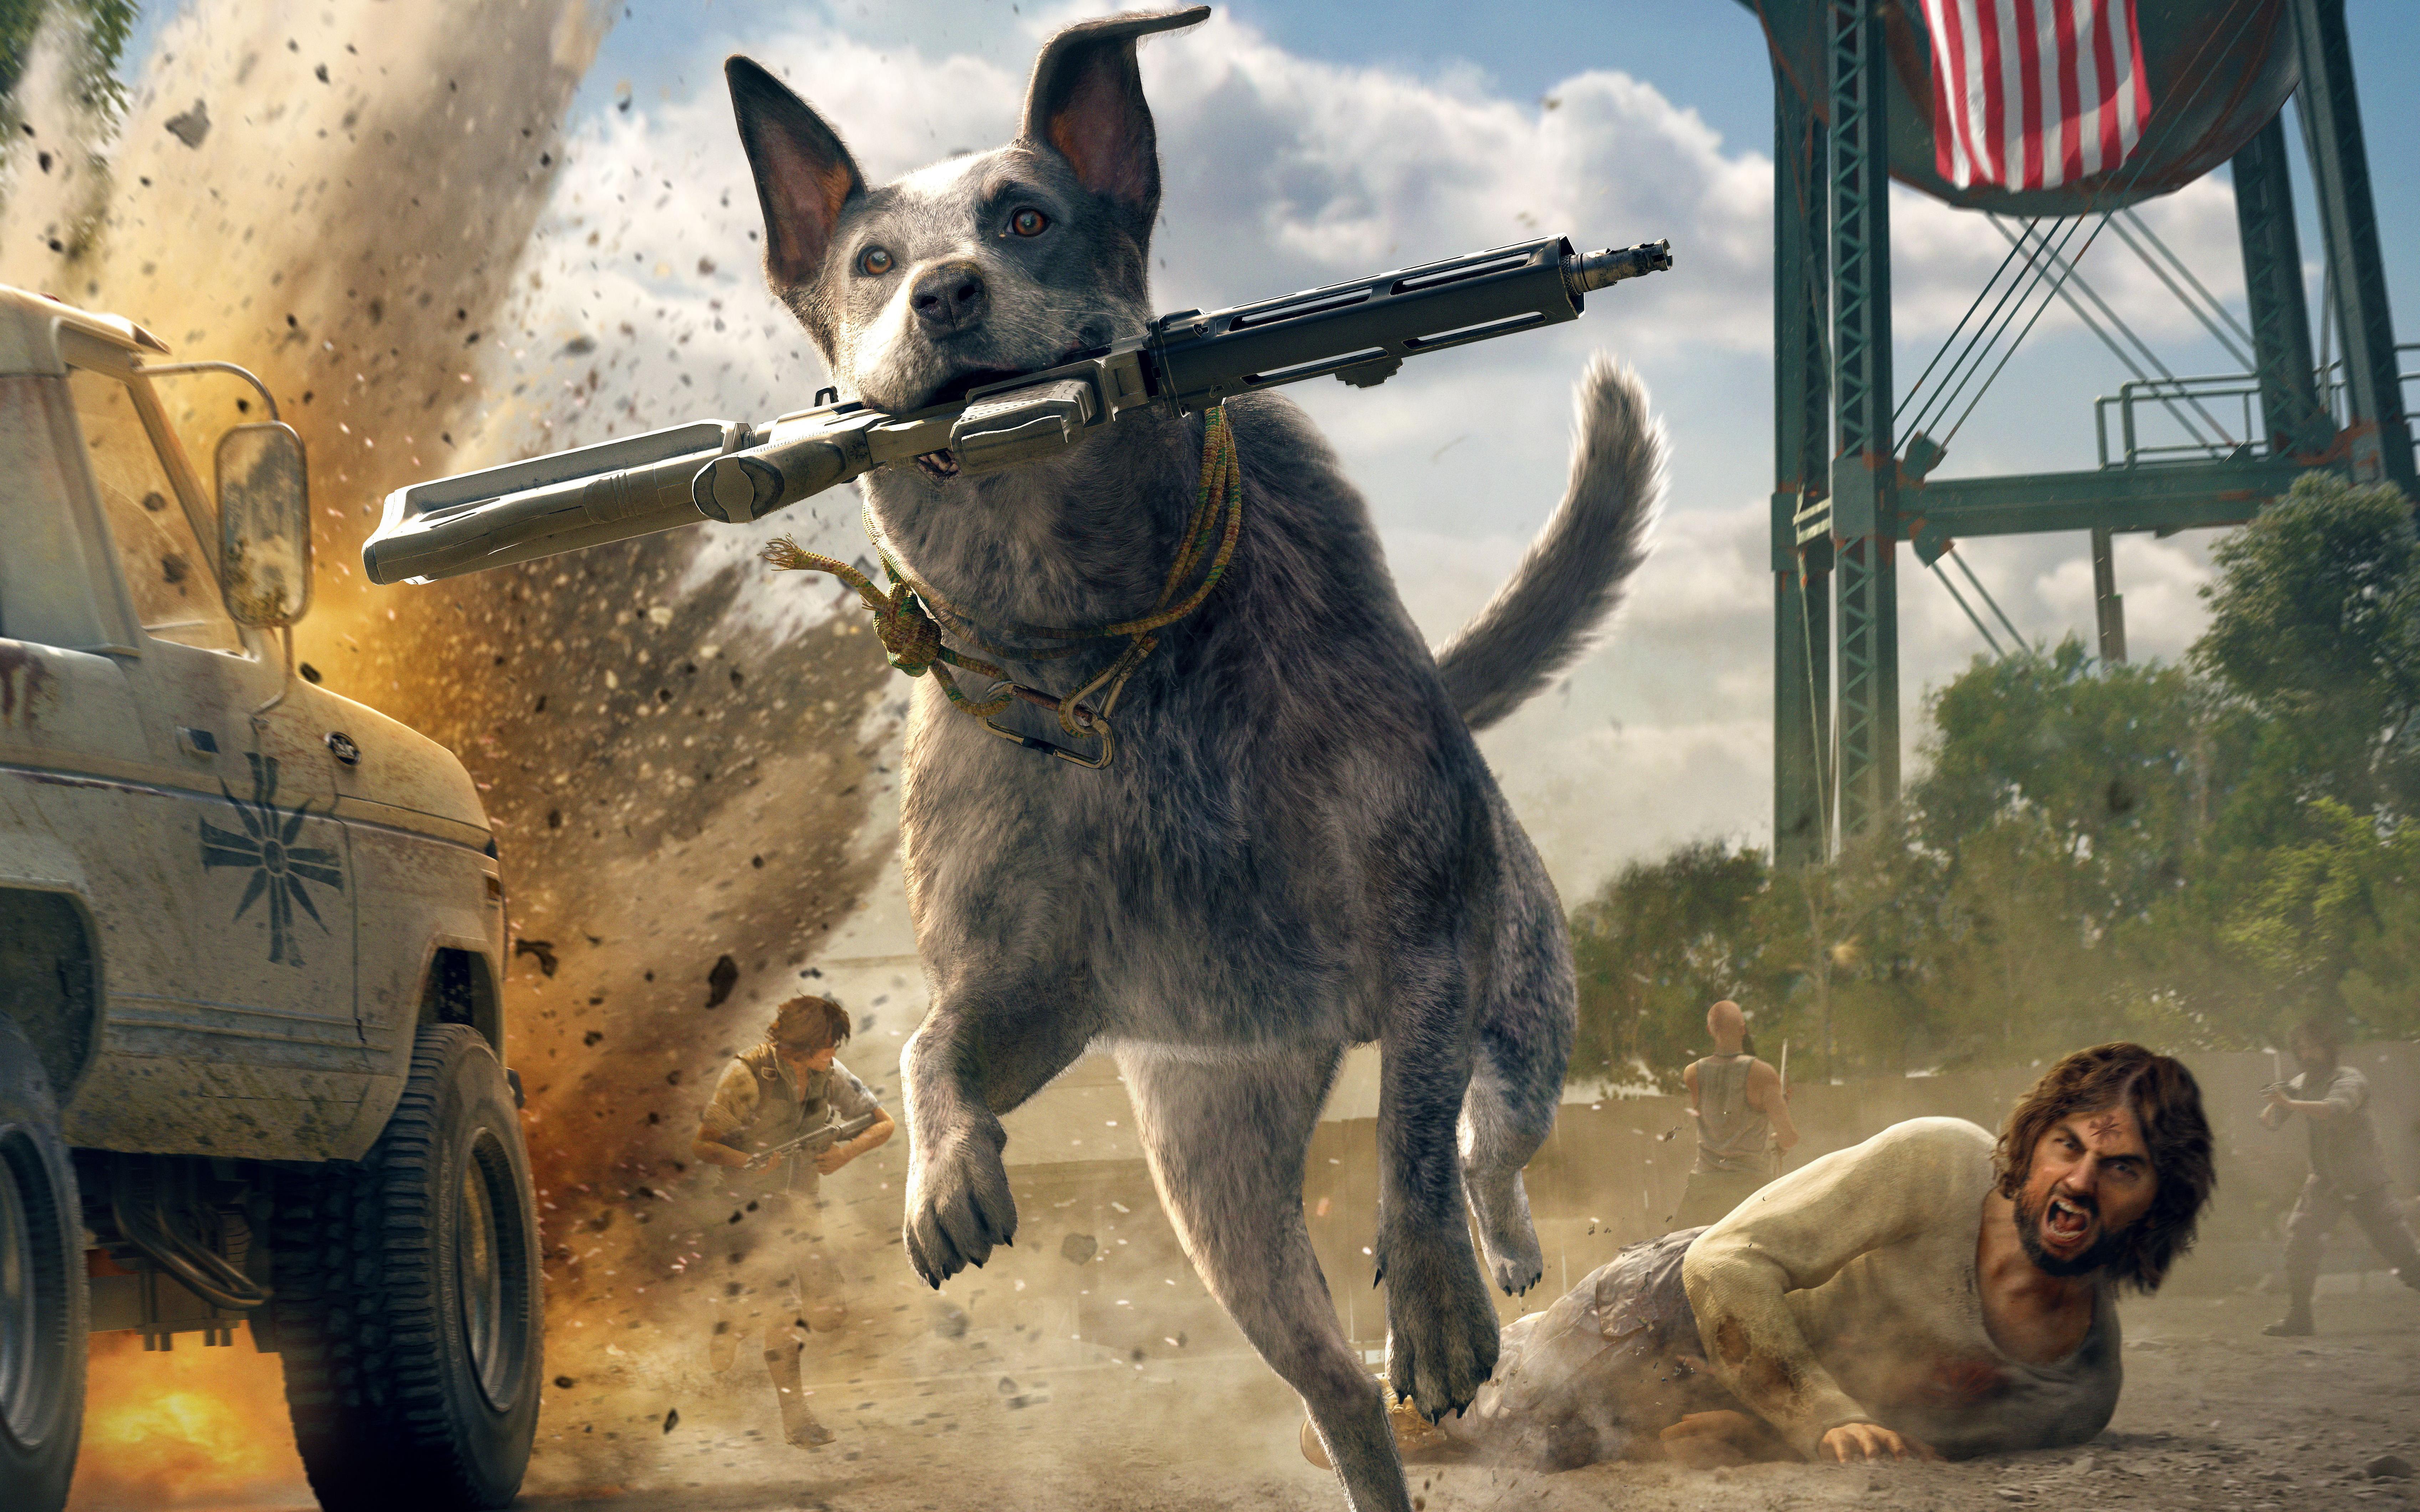 Far Cry 5 Wallpaper Hd: 2560x1440 Far Cry 5 Australian Cattle Dog 5k 1440P